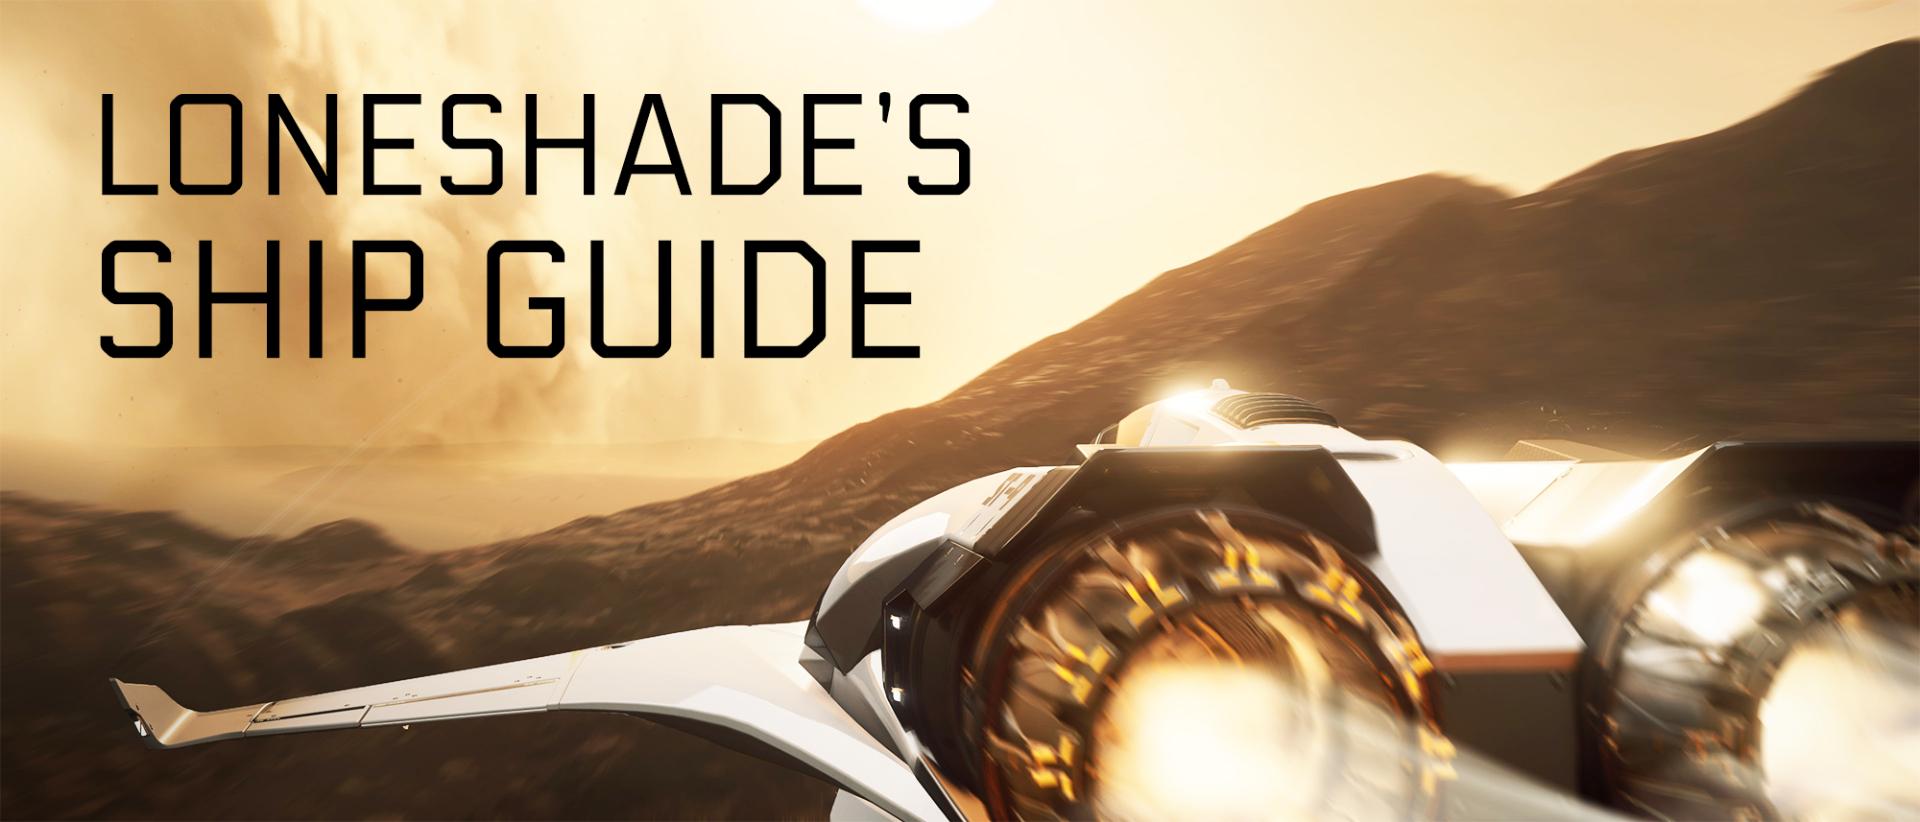 Loneshade's Ship Guide